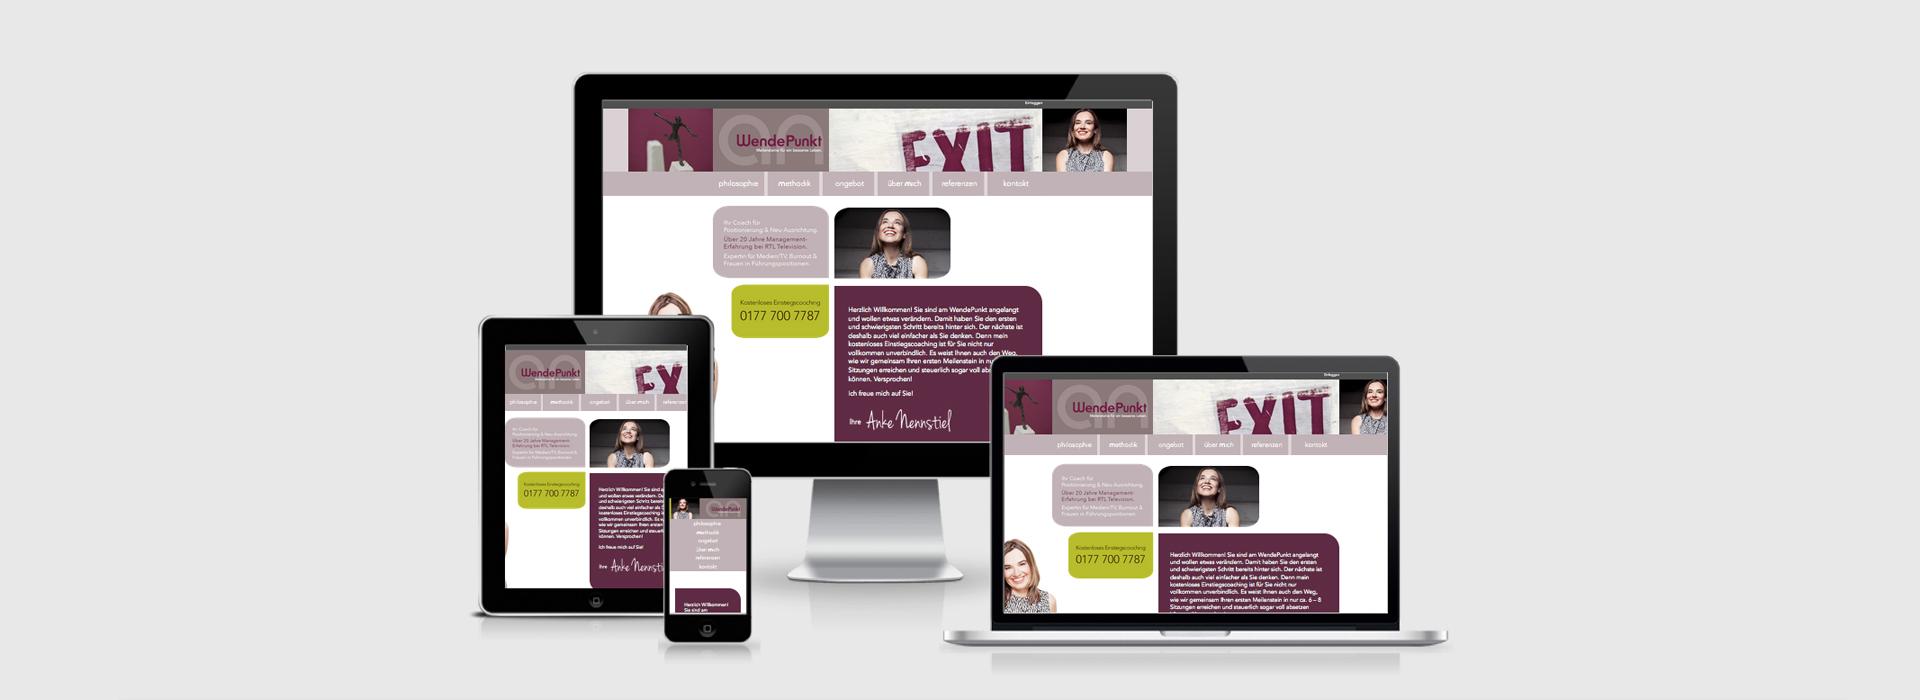 Web Design, responsive